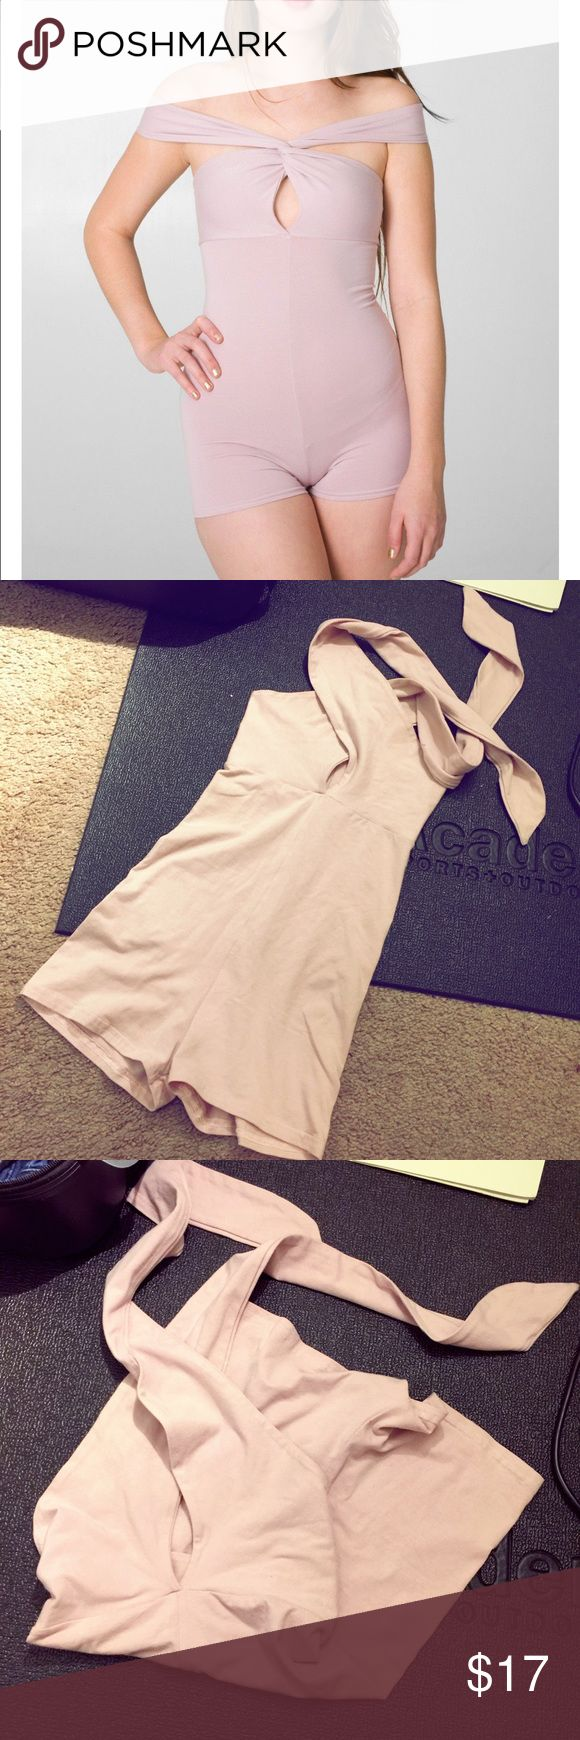 American Apparel bodysuit Size: XS, but fits like S. Brand new. American Apparel Dresses Mini